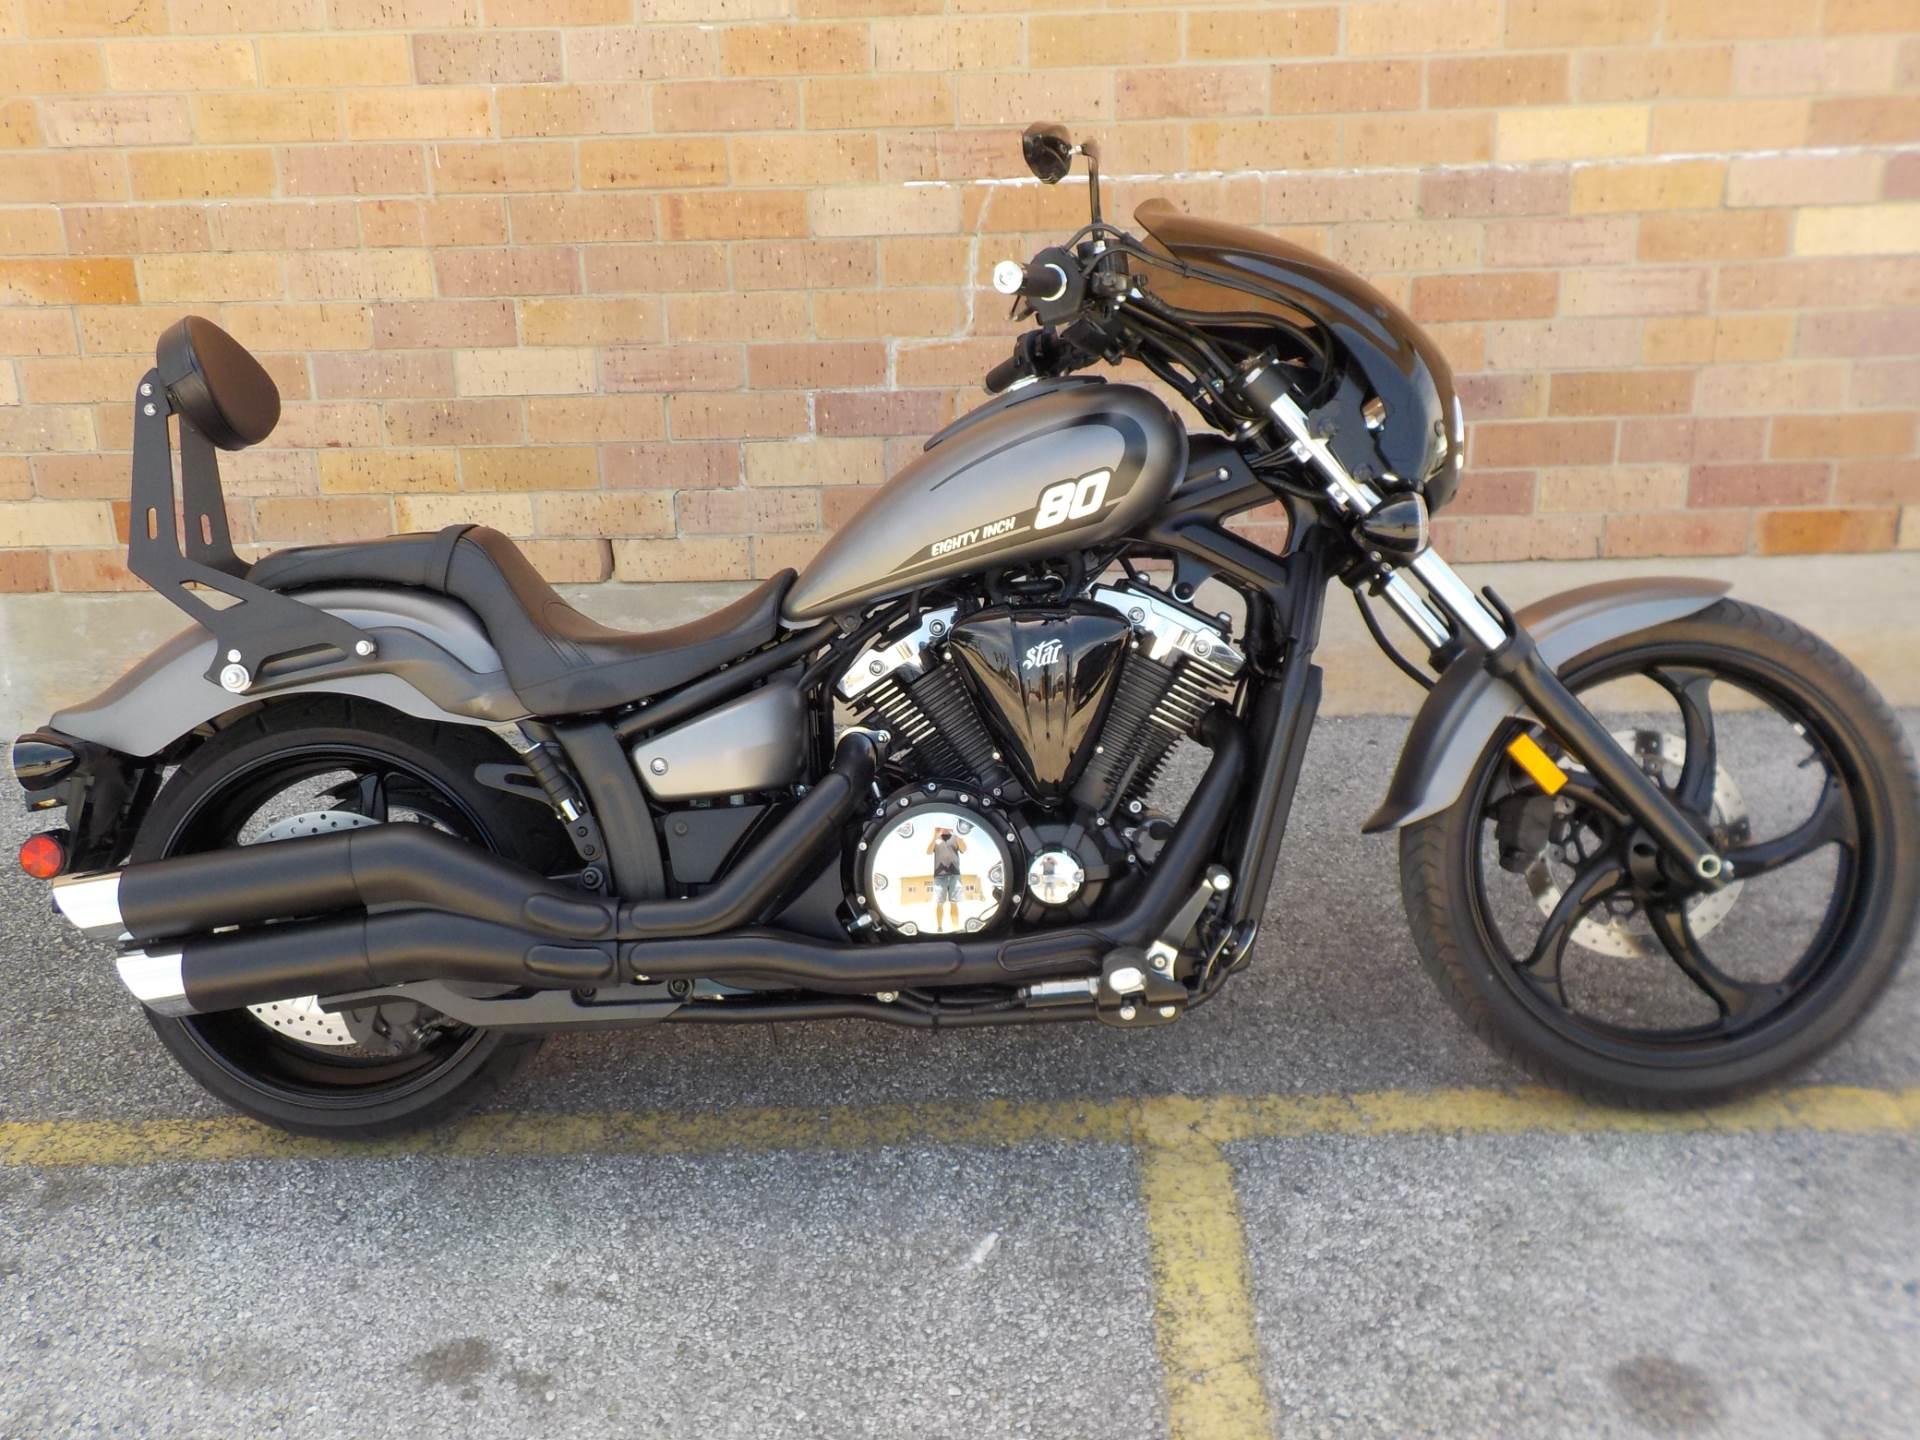 2014 Yamaha Stryker for sale 16774